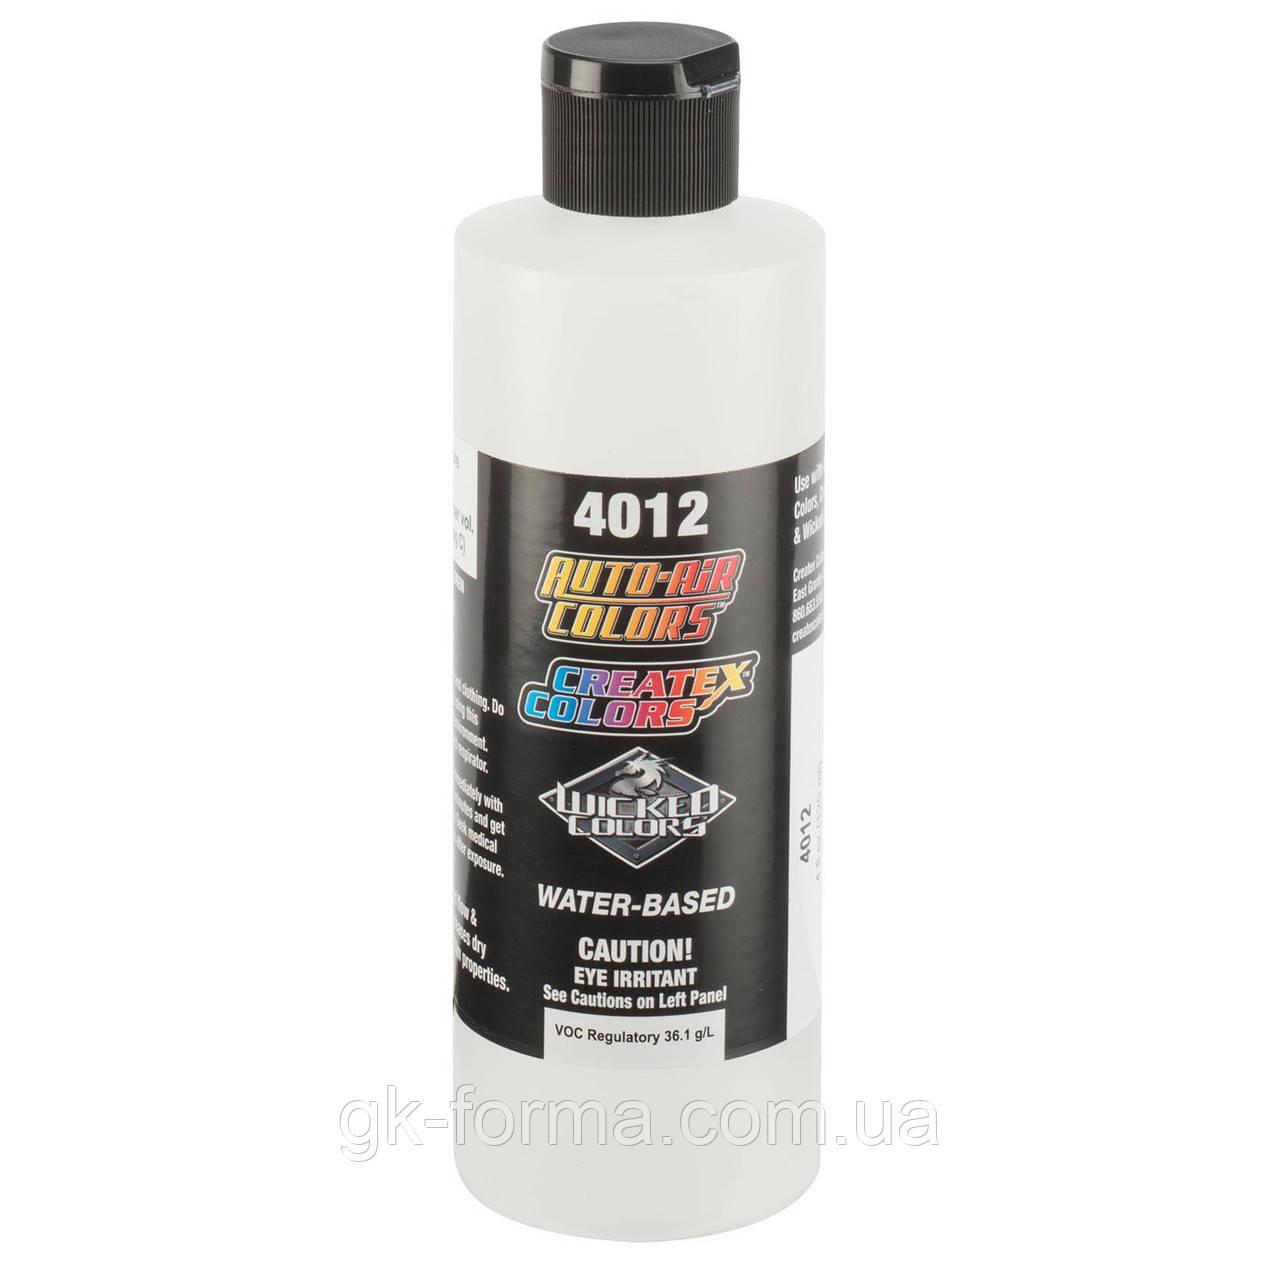 Разбавитель для краски Createx Colors 4012 High Performance Reducer